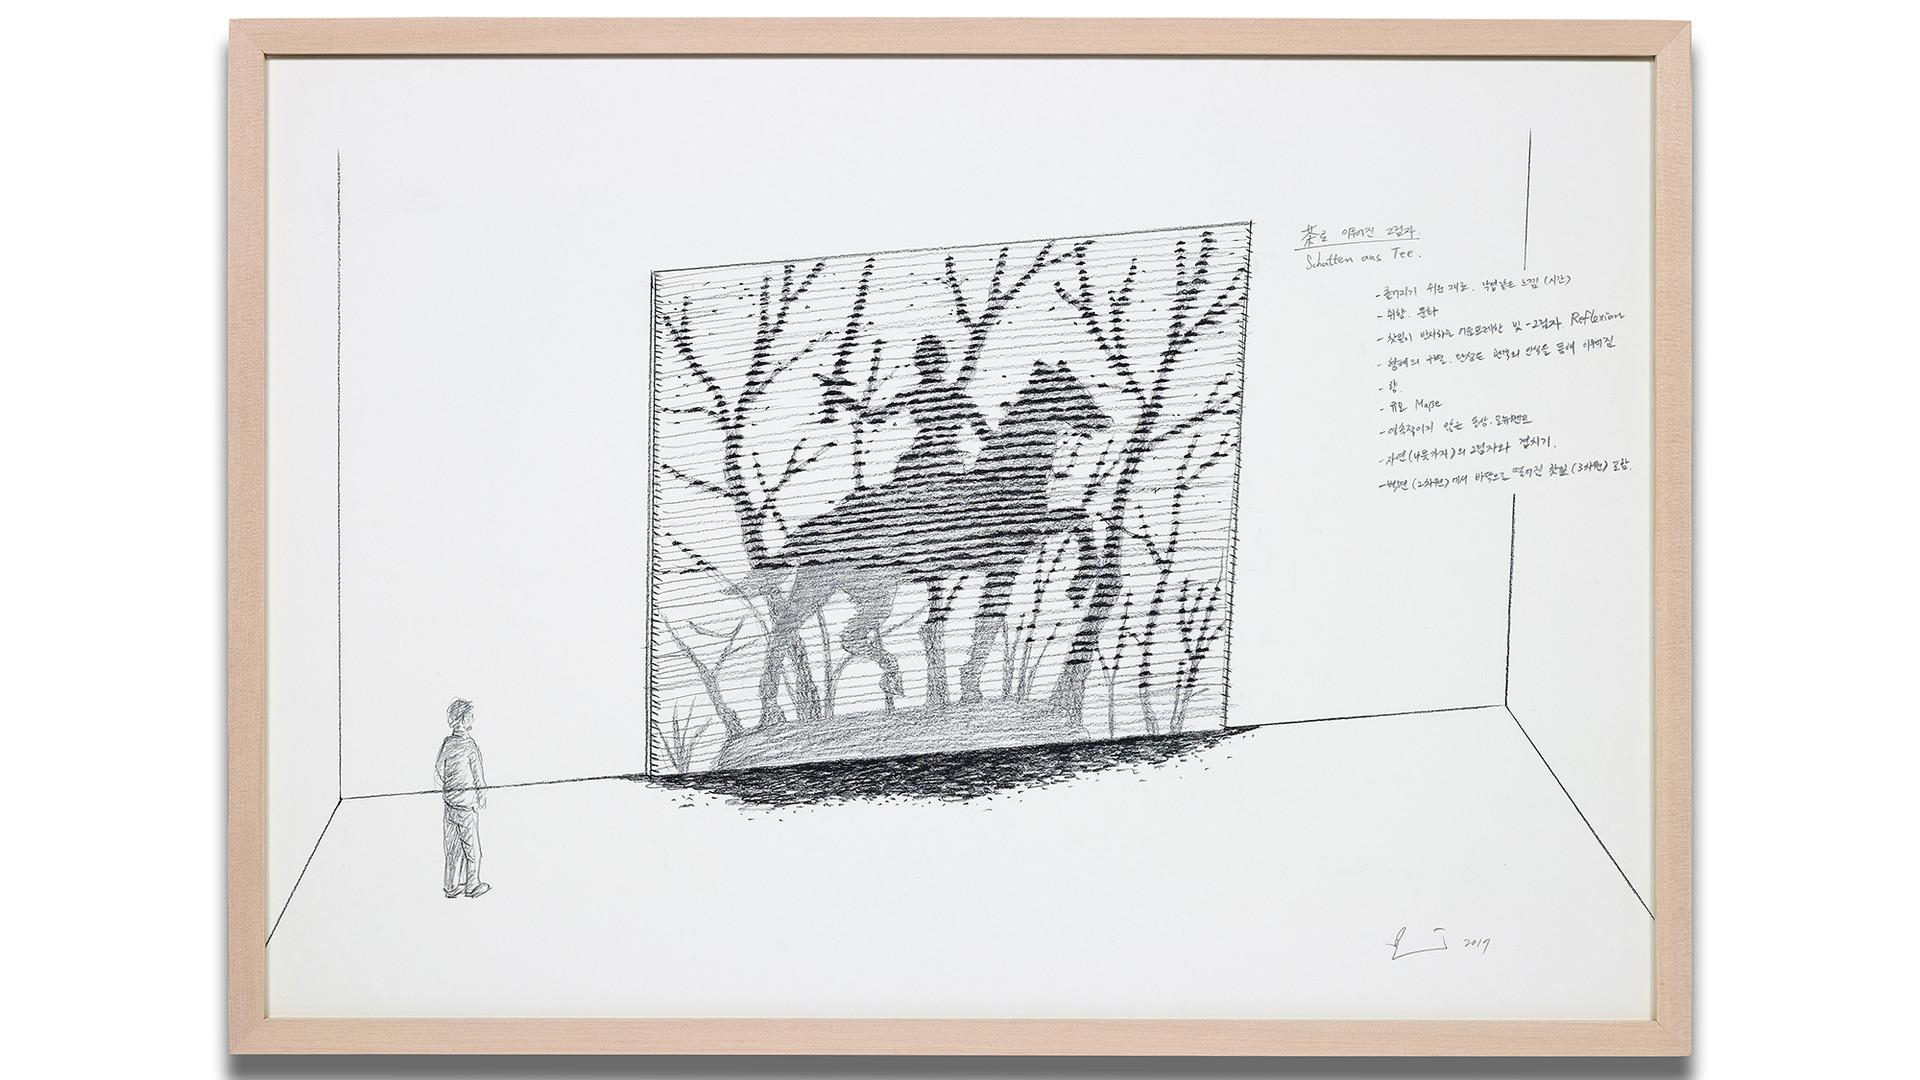 Changwon Lee, Shadow of Heroe, 2017, conte, pencil on paper, 56.5x80cm